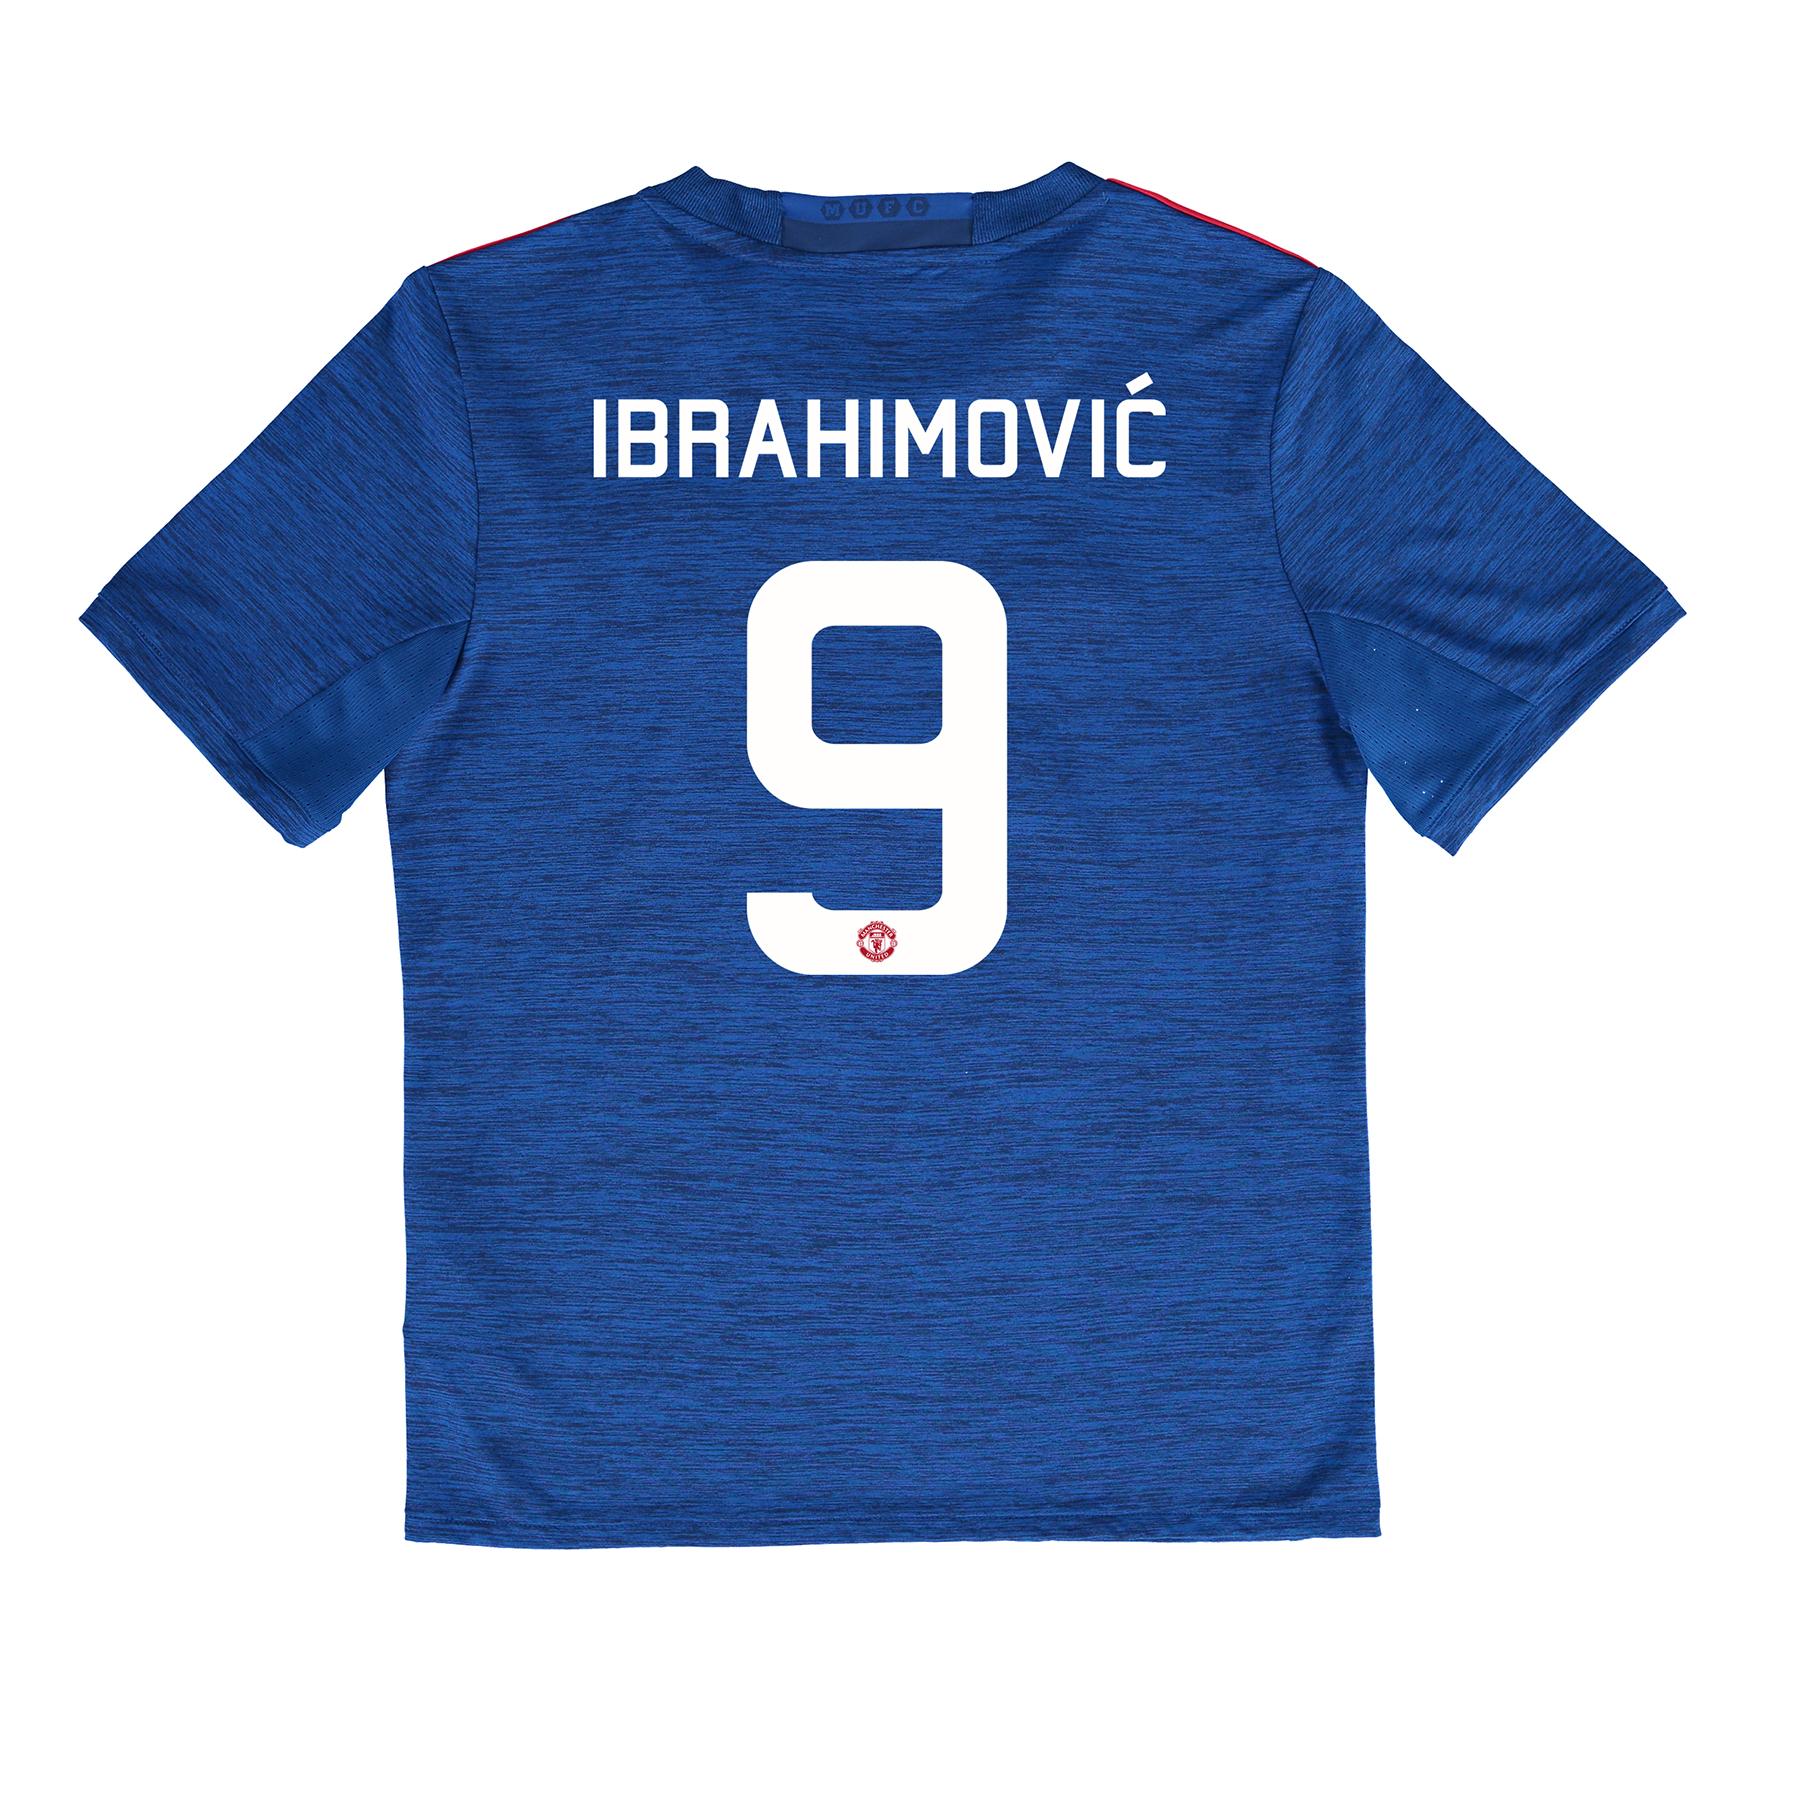 Manchester United Cup Away Shirt 2016-17 - Kids with Ibrahimovic 9 pri